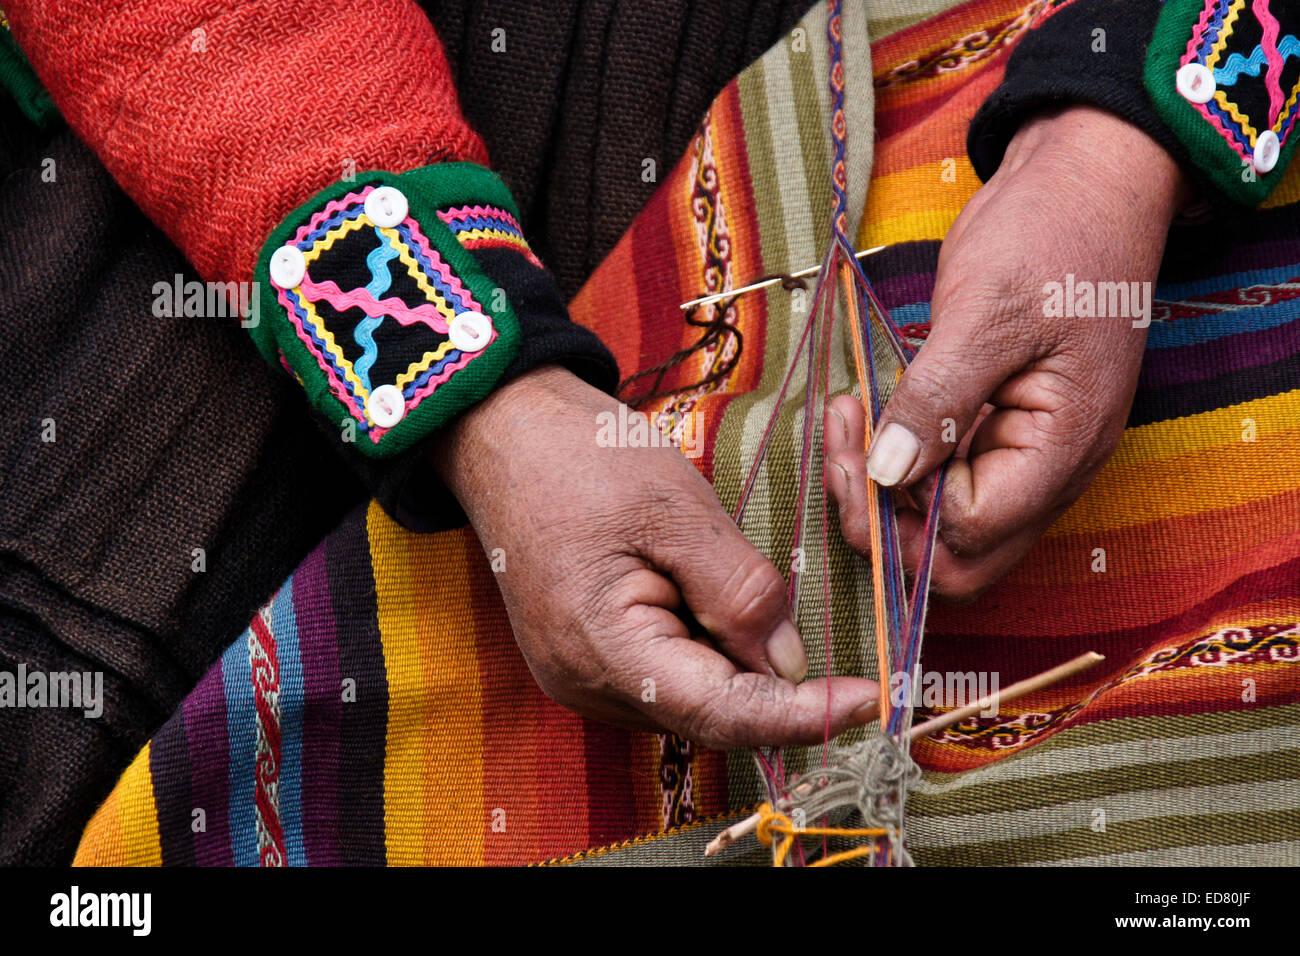 Quechua Indian woman weaving textile, Chinchero, Urubamba Valley, Peru - Stock Image